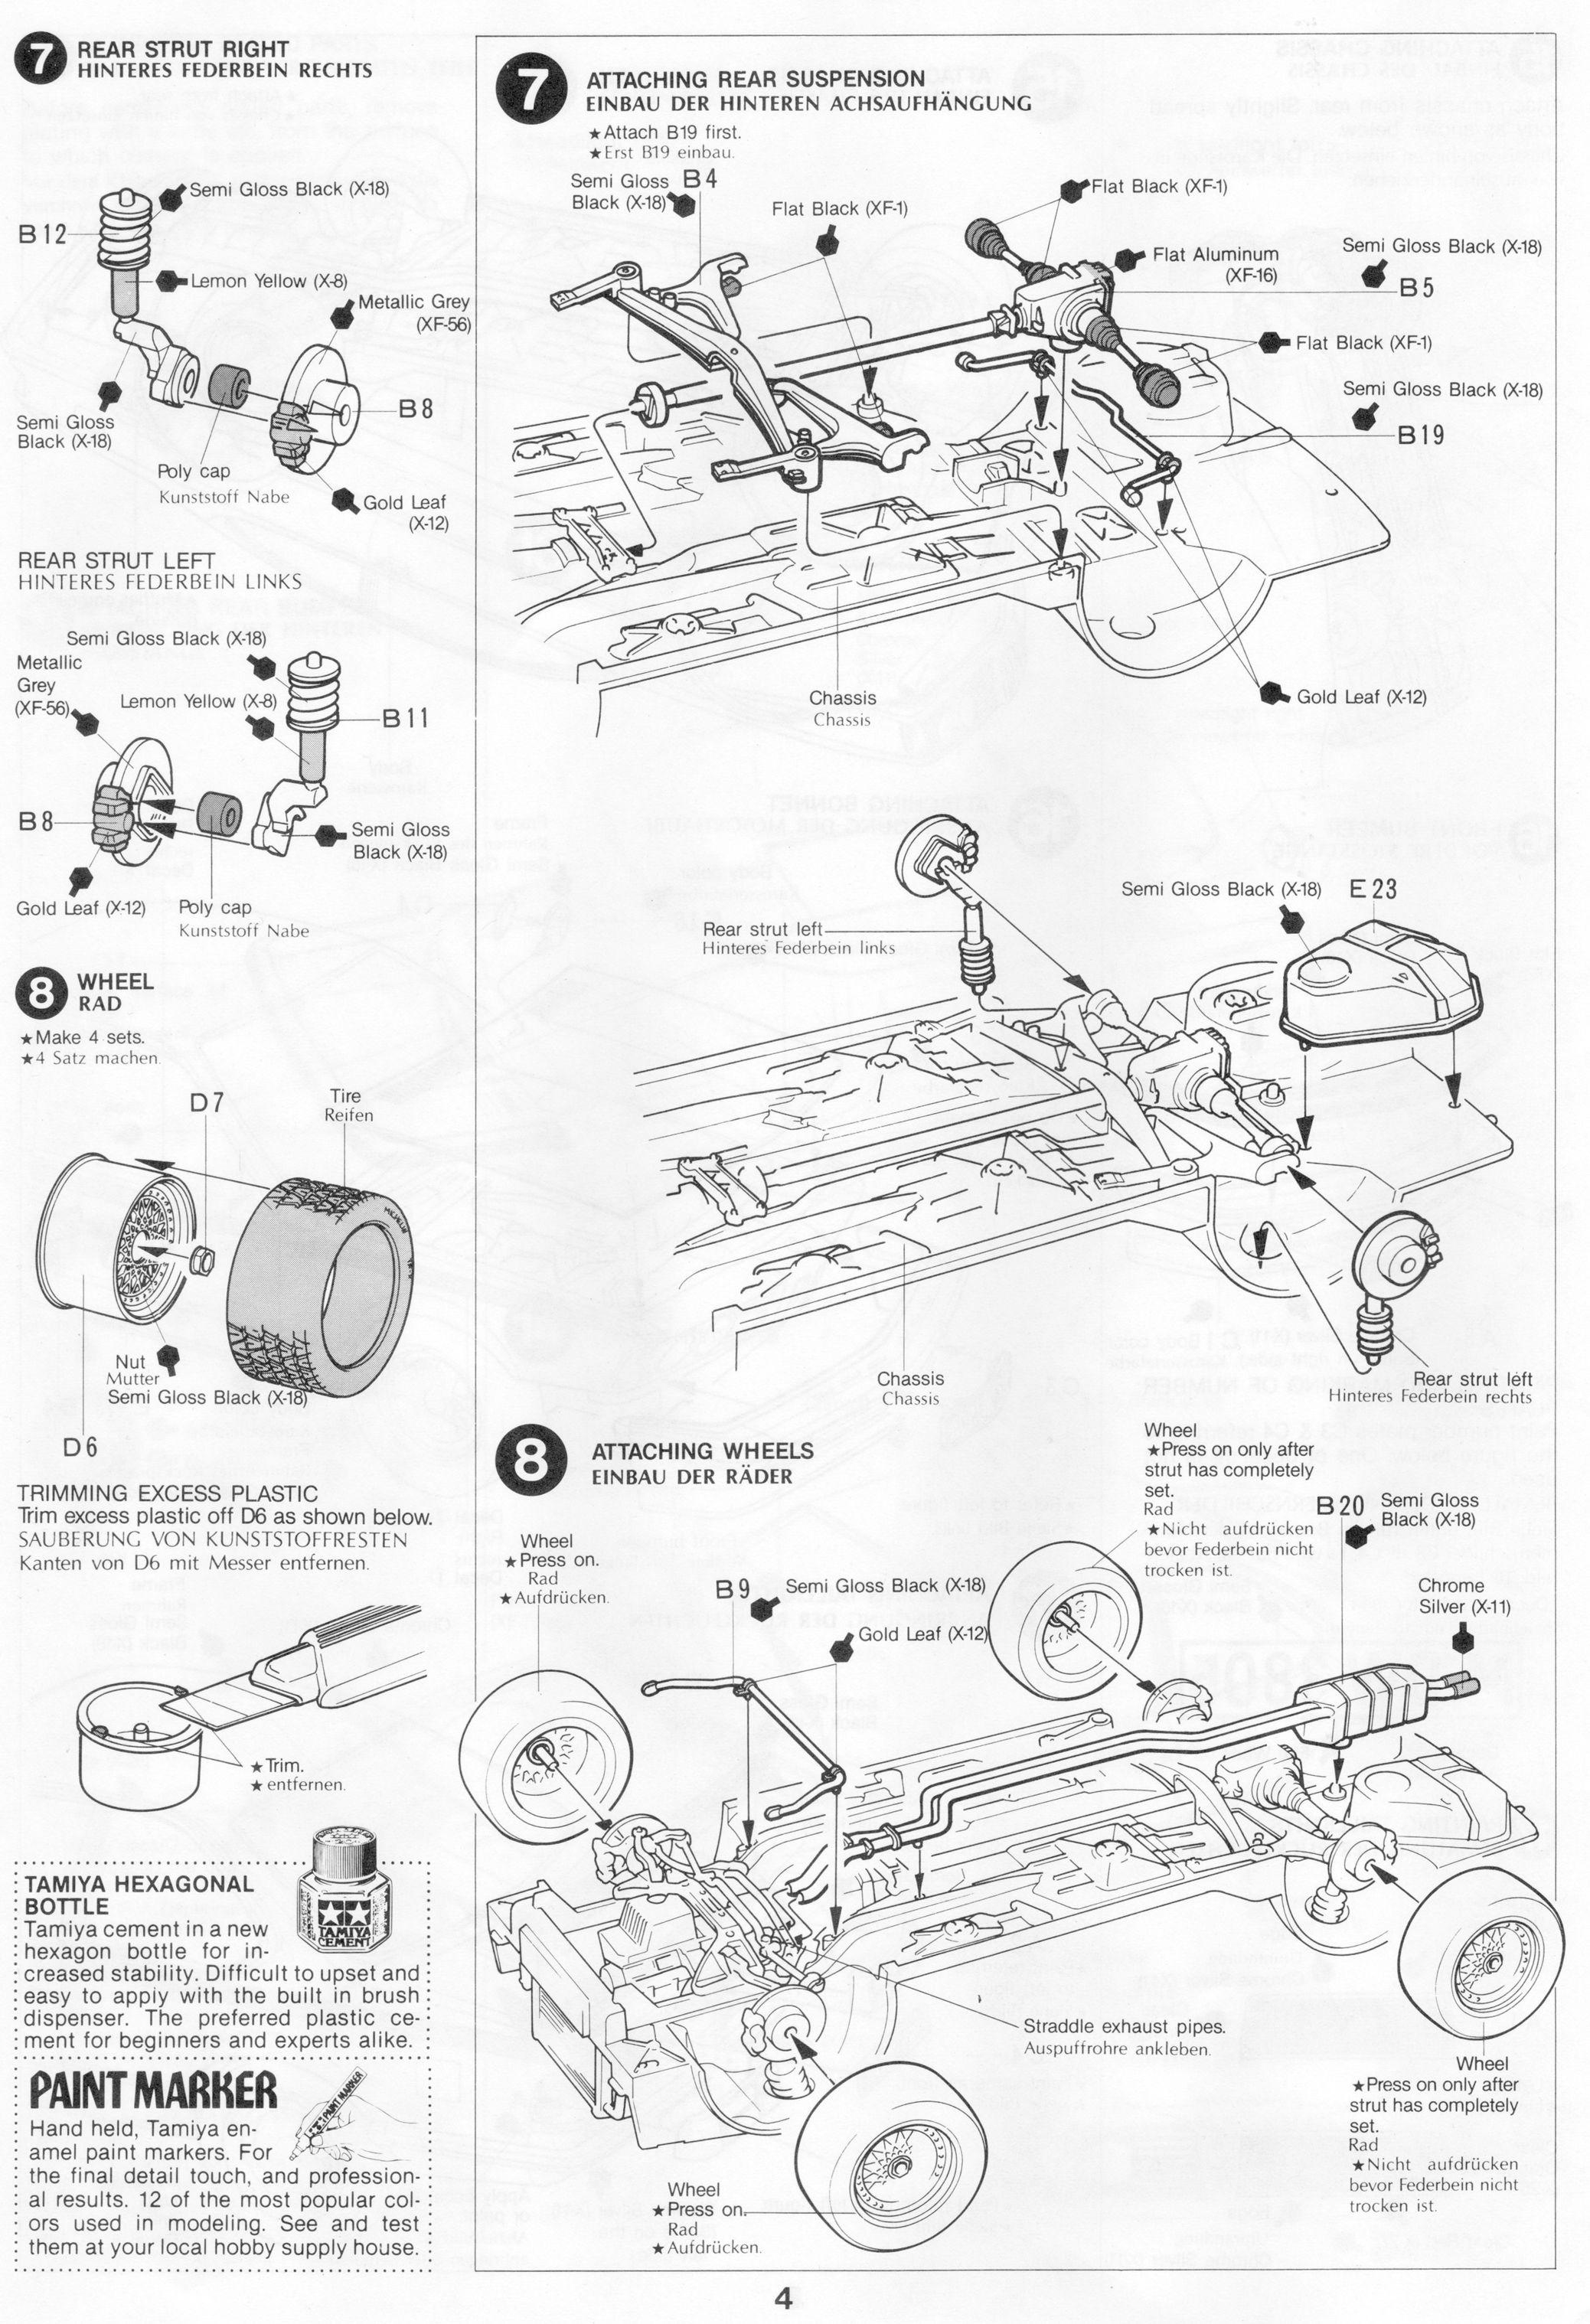 96 Subaru Impreza Engine Diagram   Wiring Diagram on